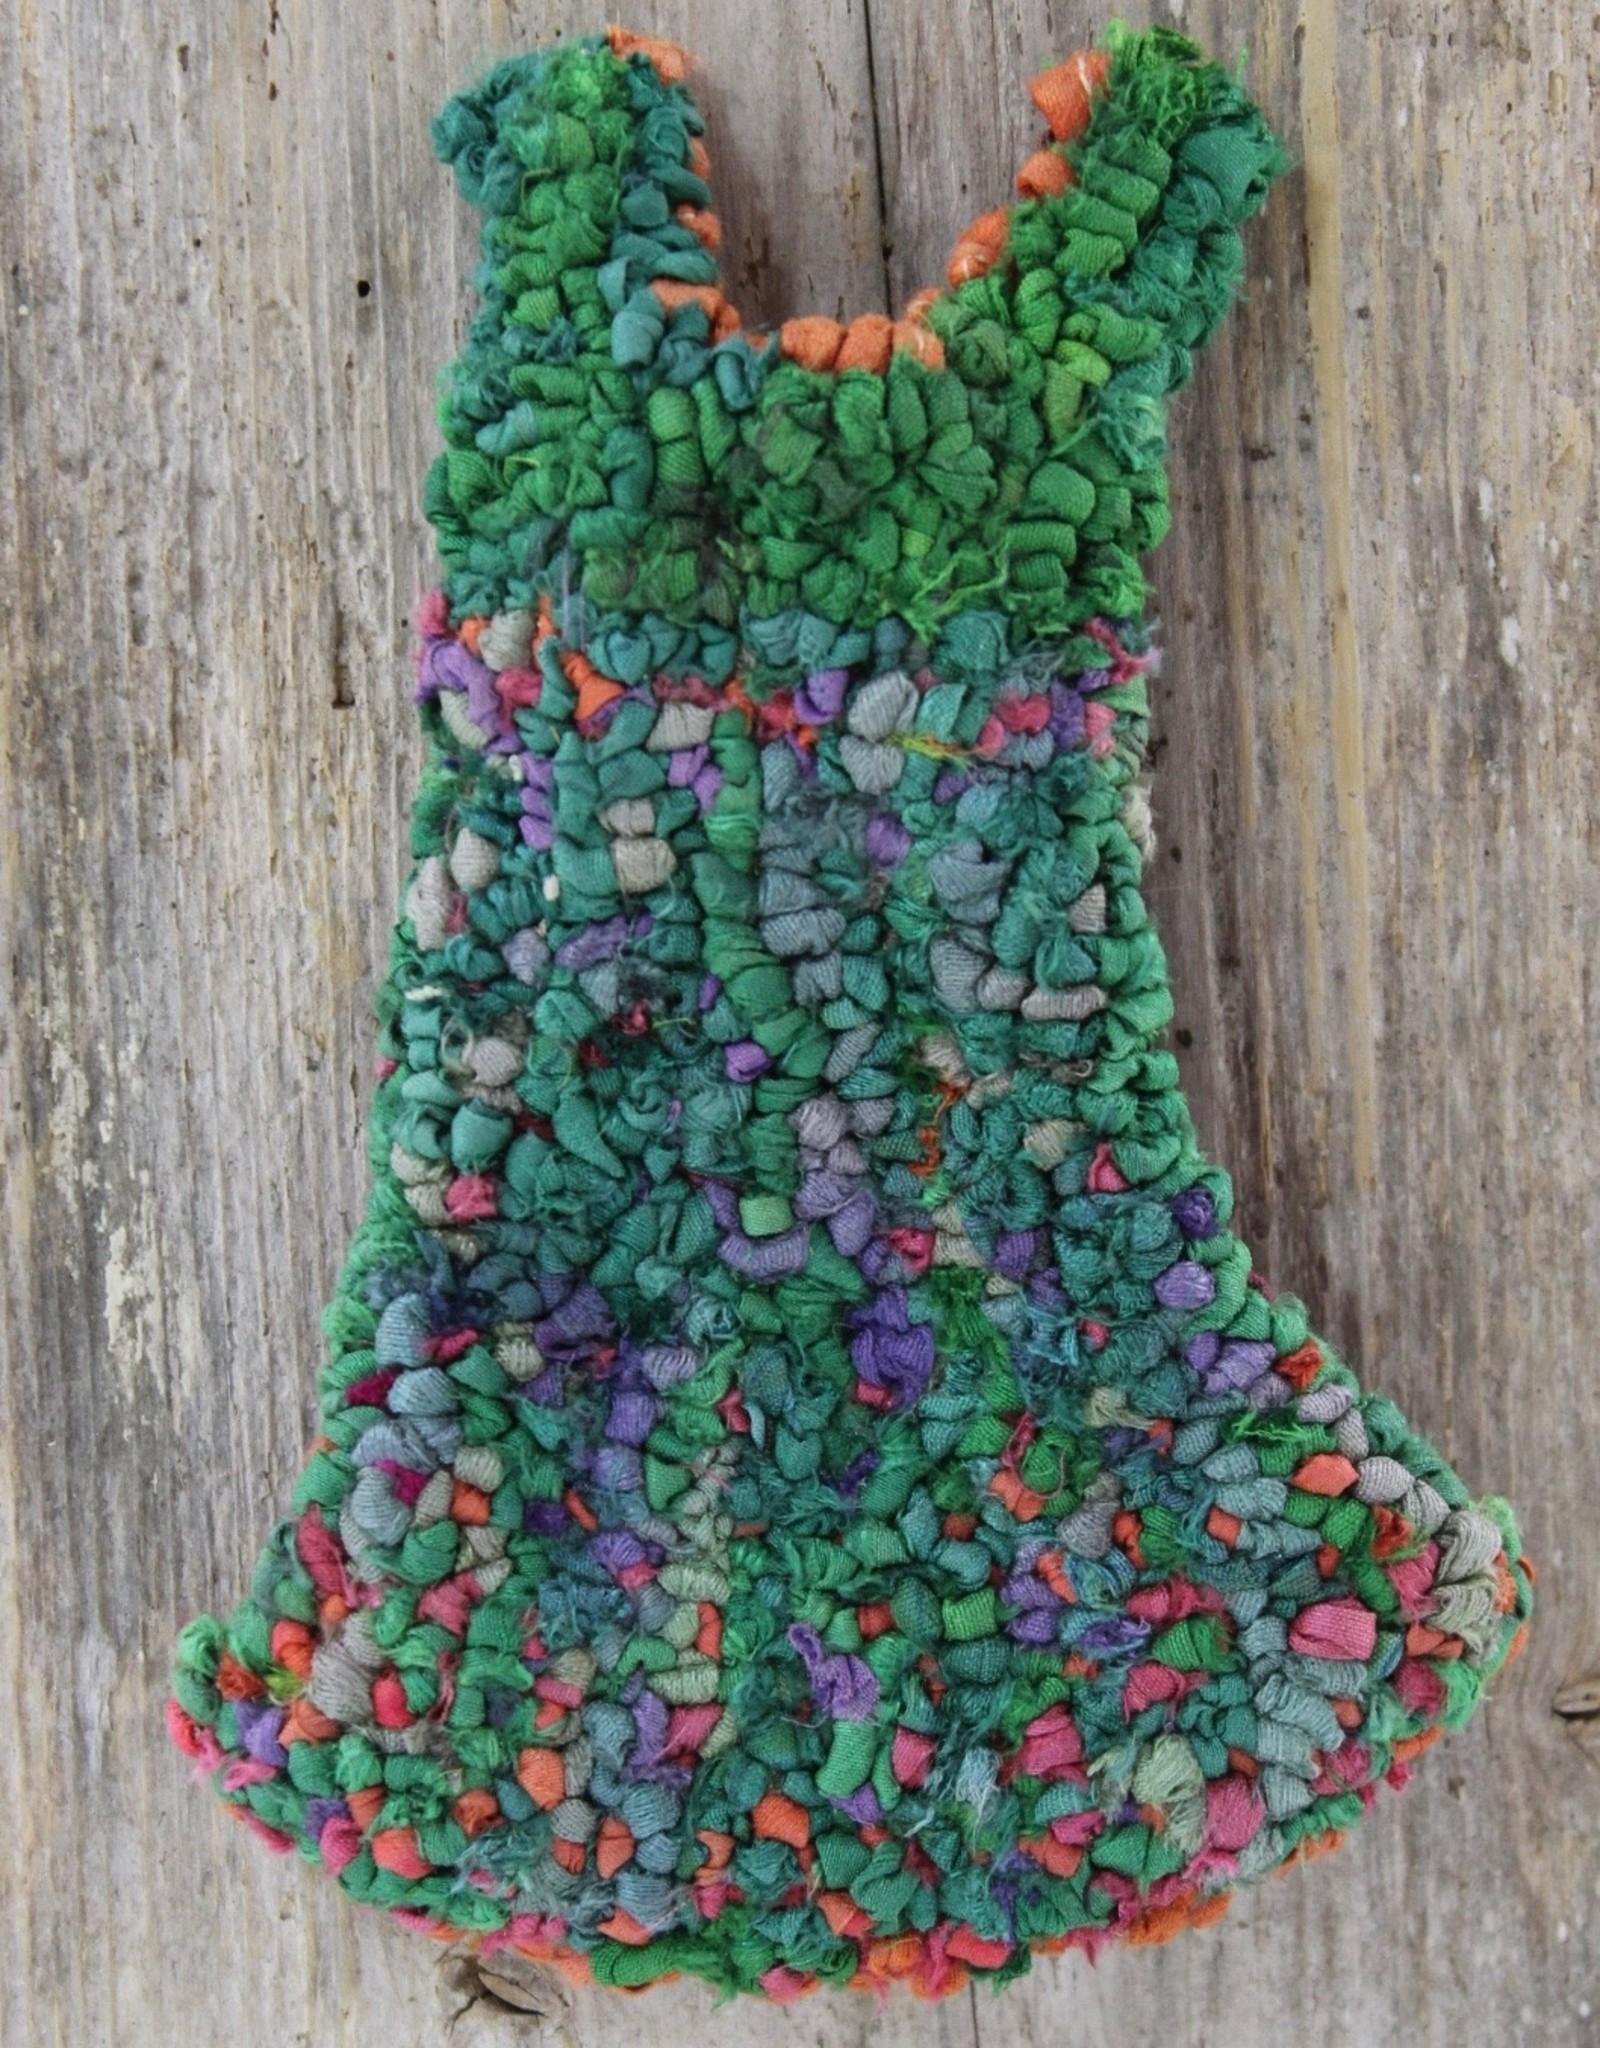 Mervi Haapakoski Dress on Driftwood by Mervi Haapakoski